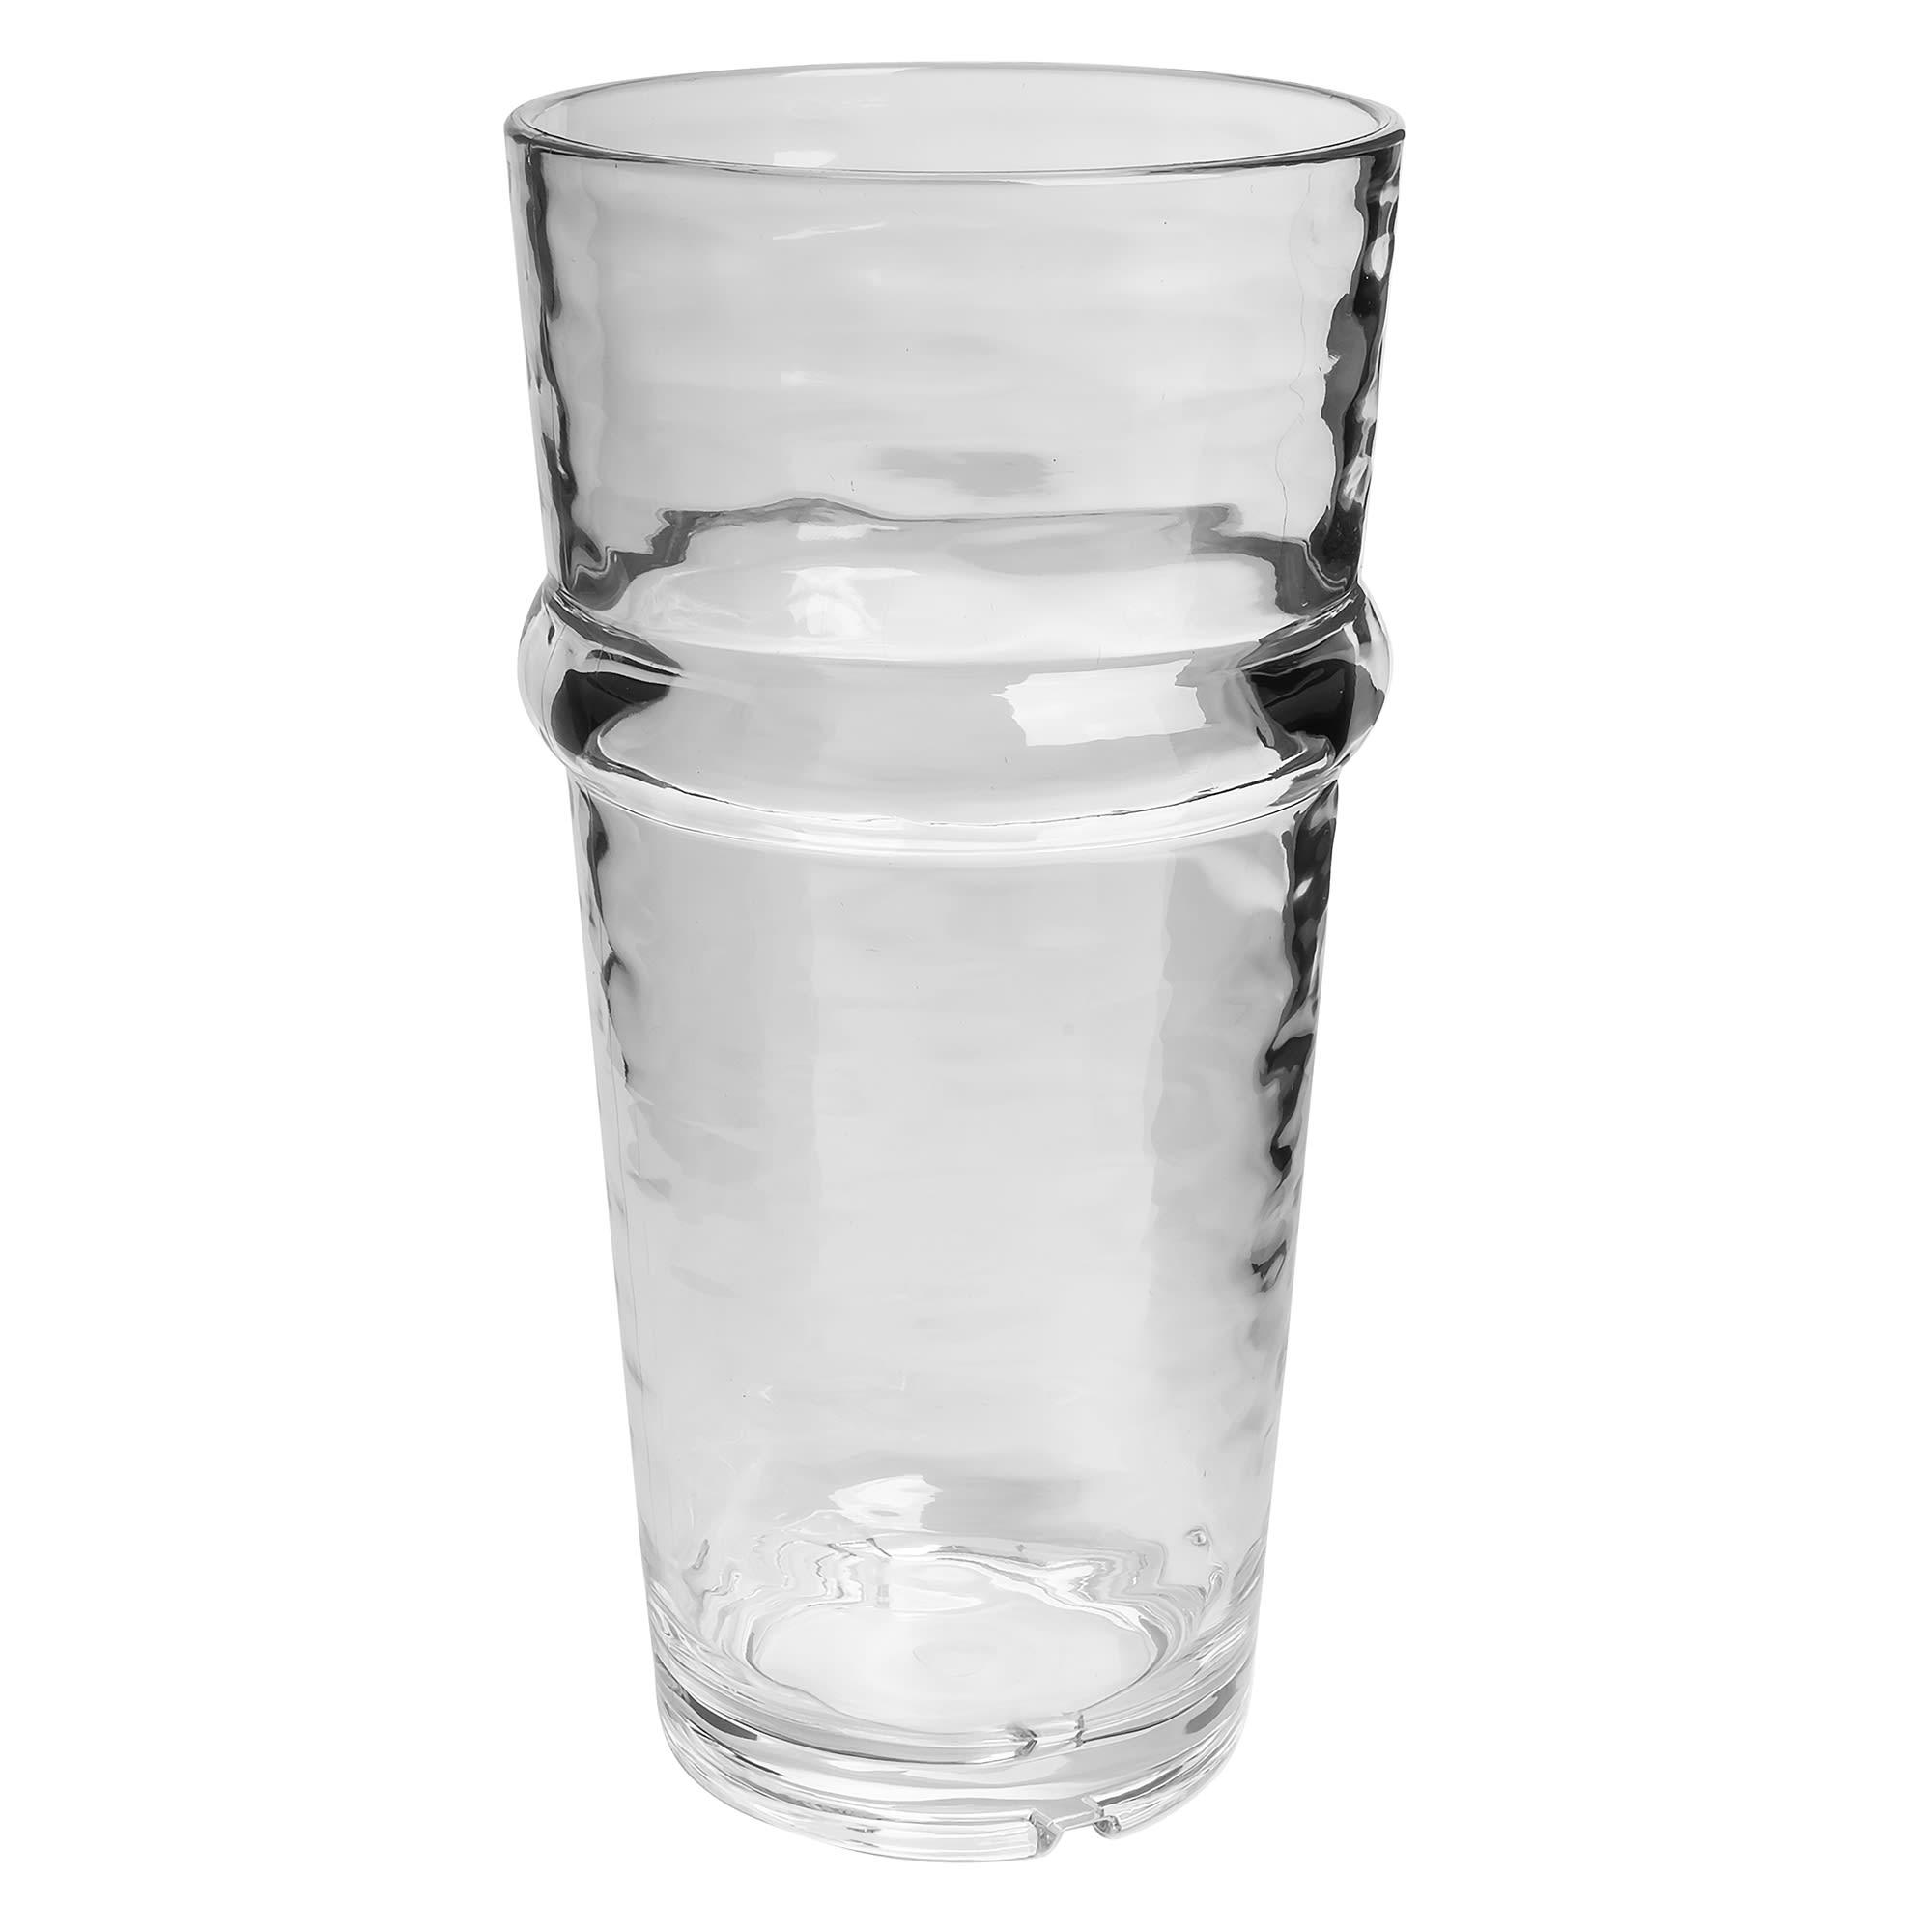 Libbey 92431 12 oz Beverage Glass, Wake™, Clear Plastic